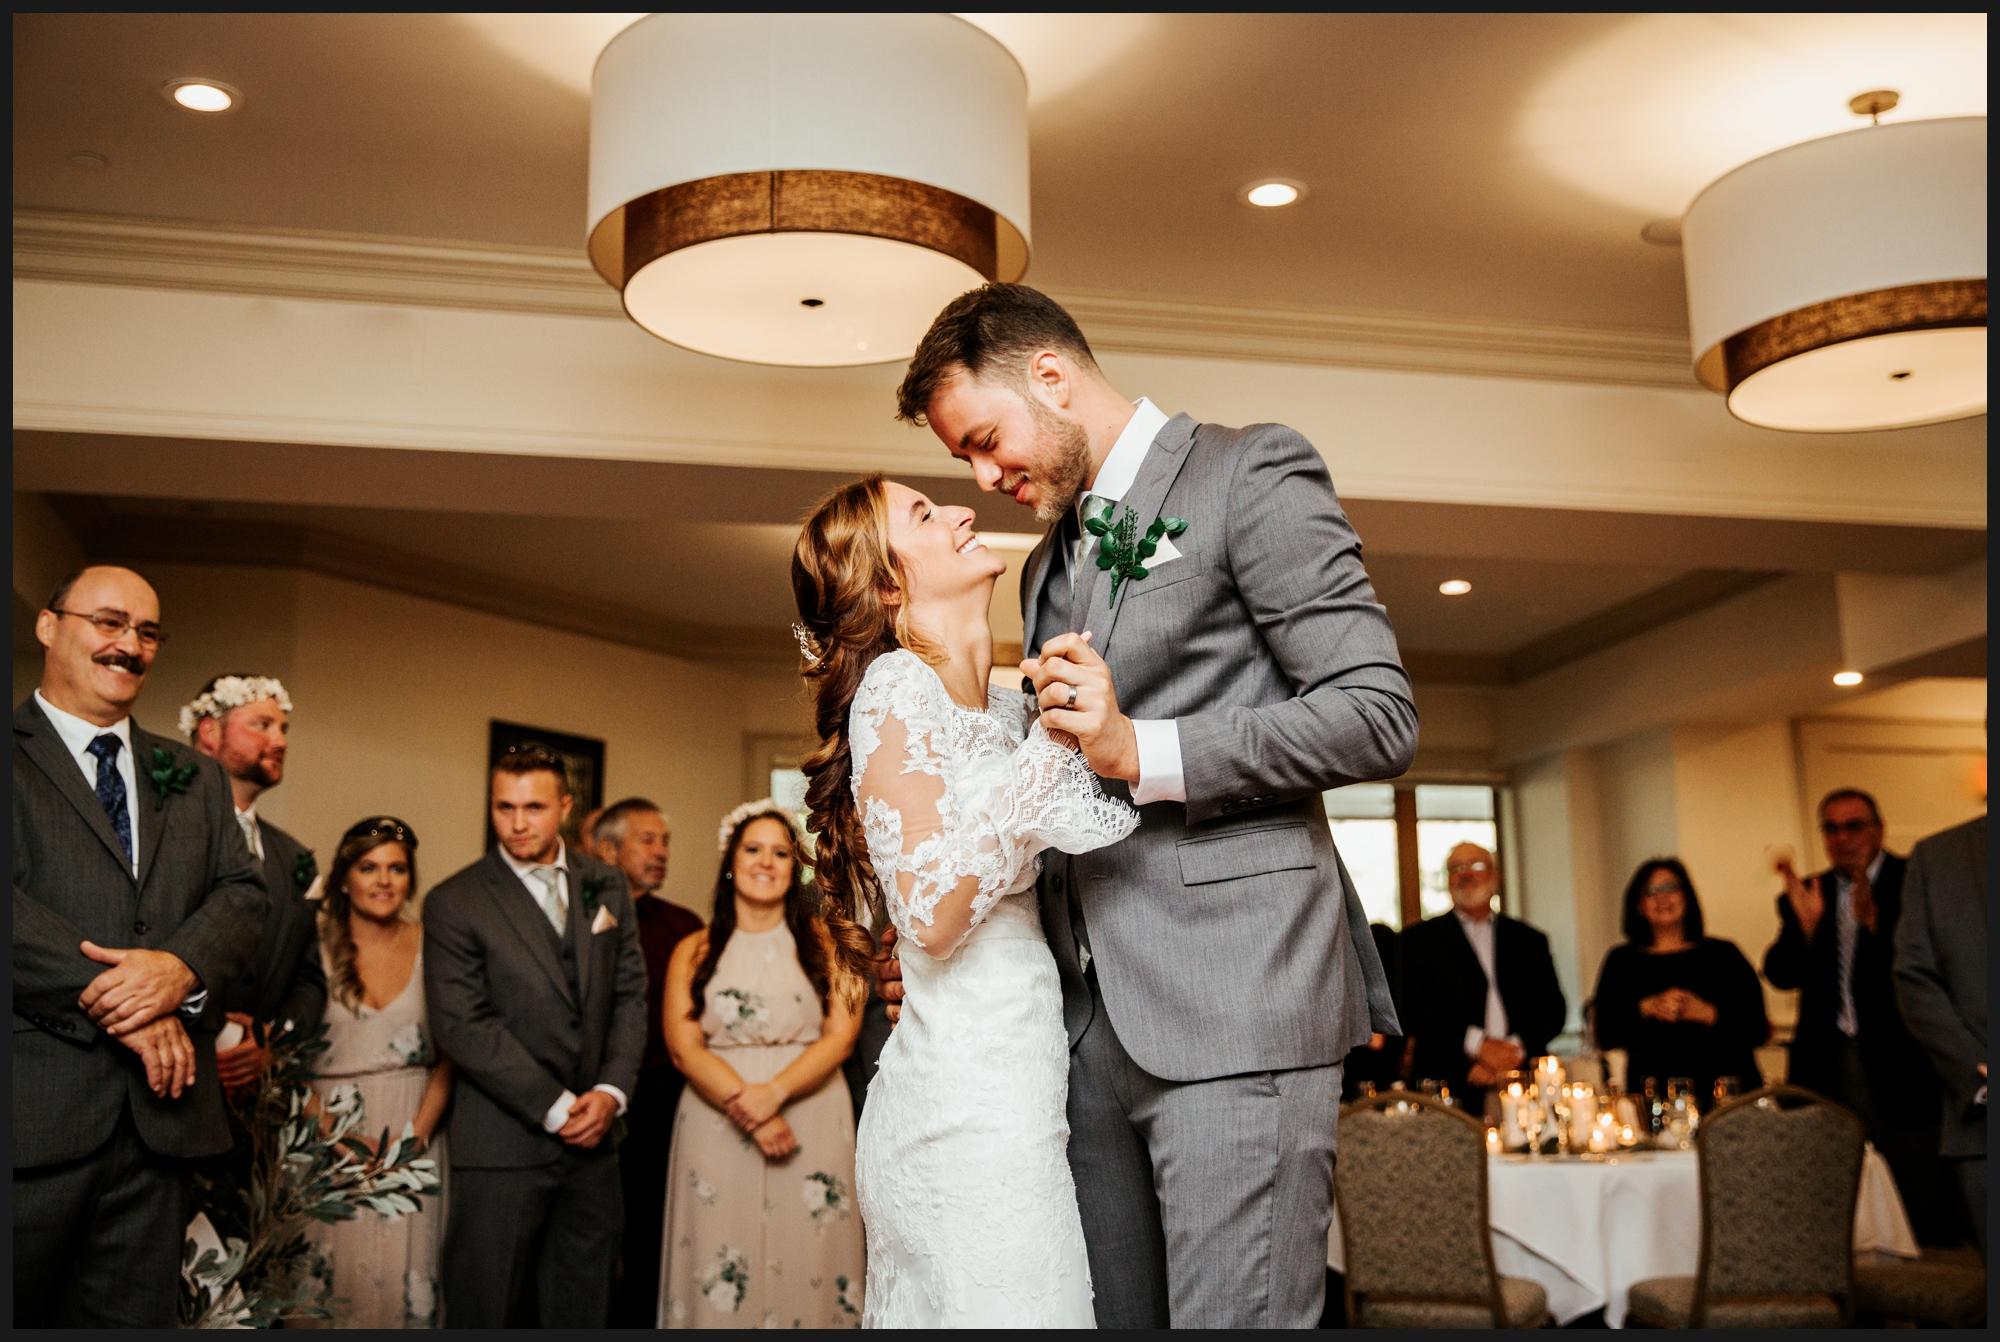 Orlando-Wedding-Photographer-destination-wedding-photographer-florida-wedding-photographer-hawaii-wedding-photographer_0167.jpg